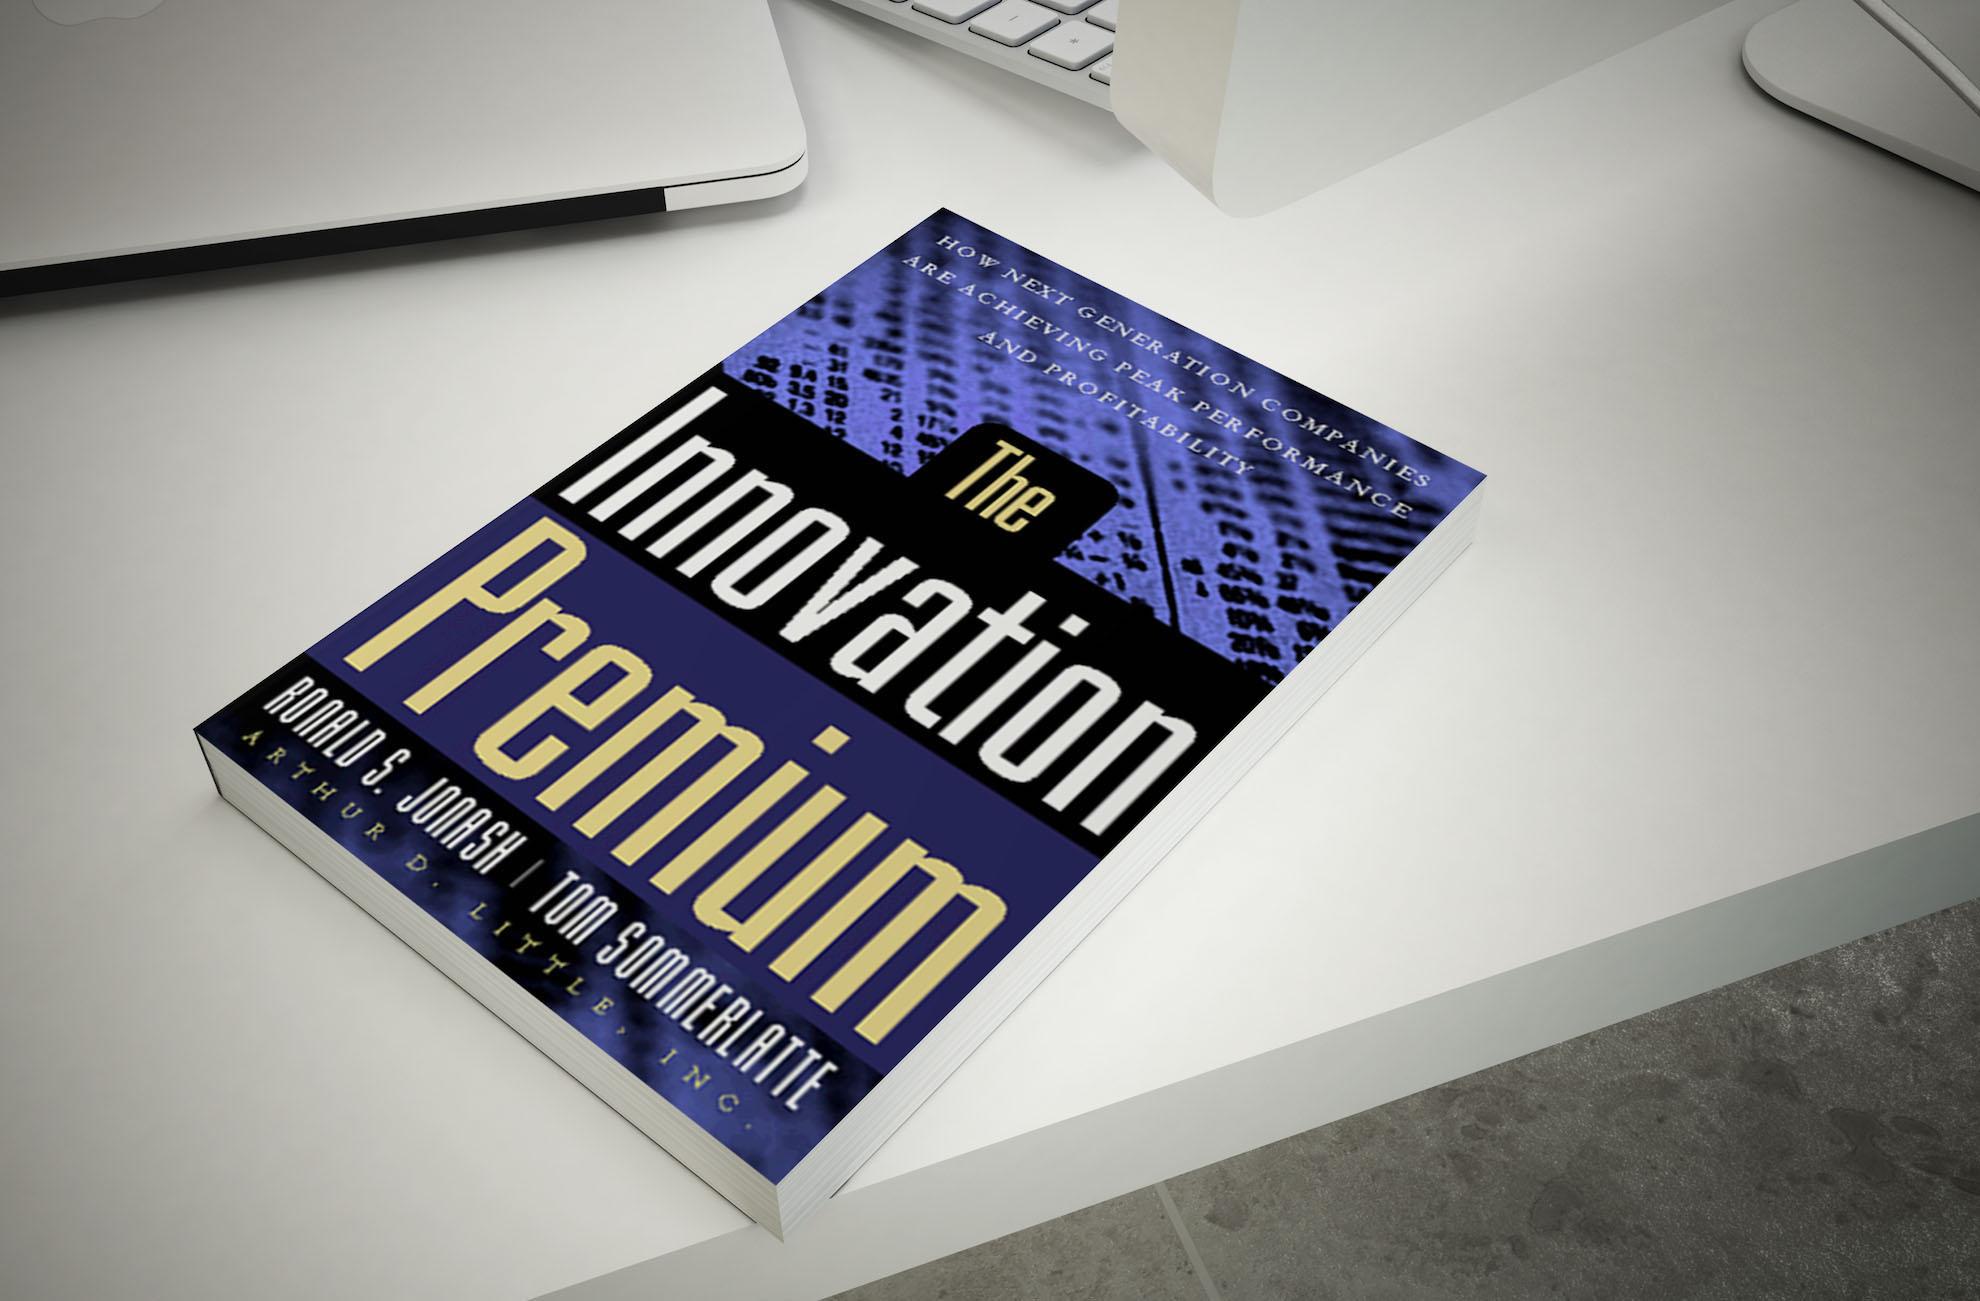 The Innovation Premium